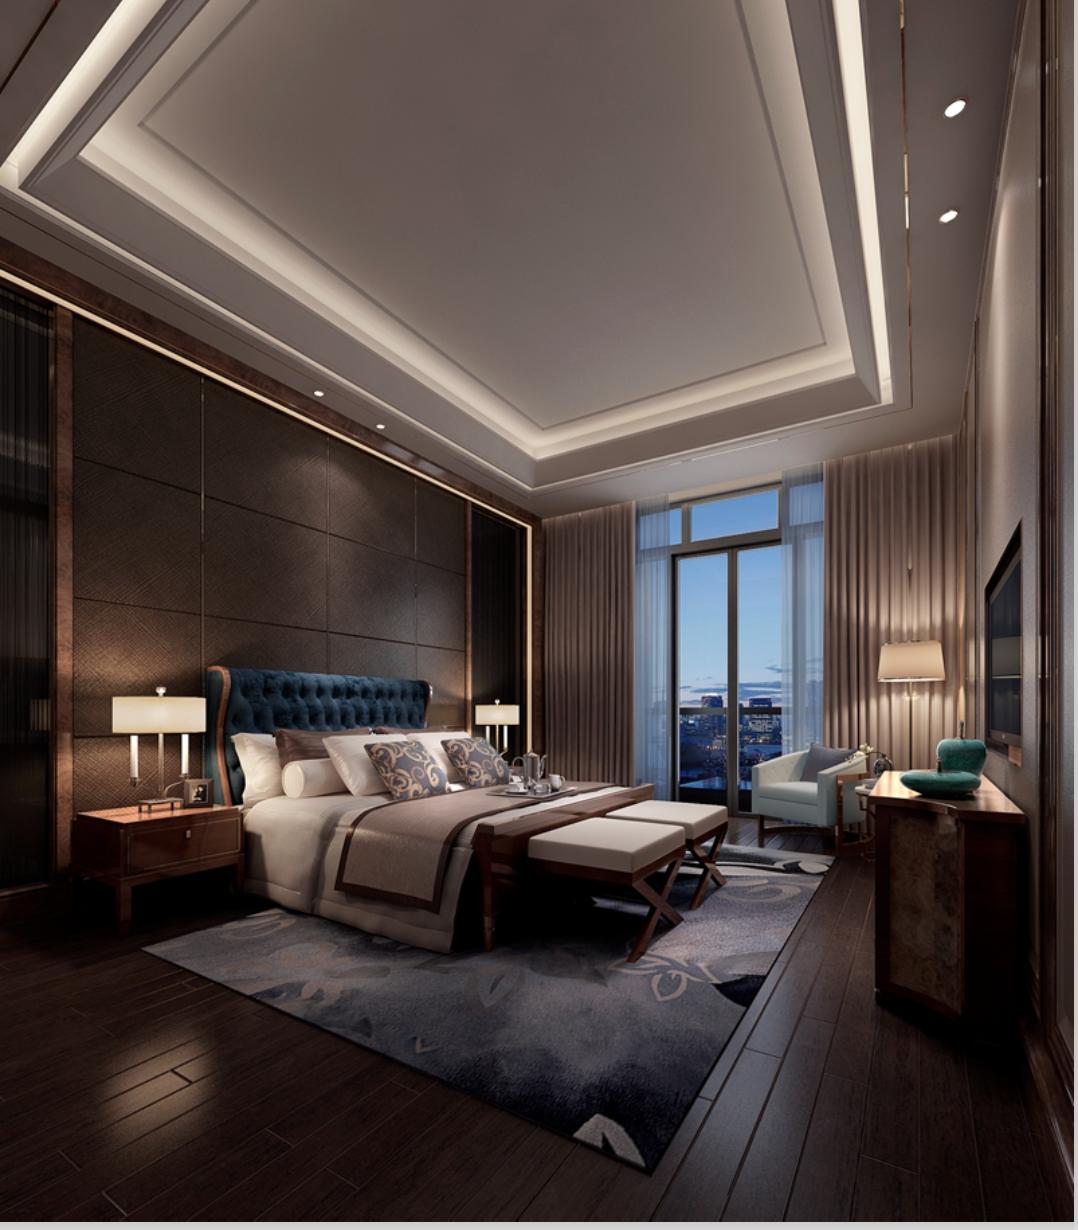 Romantic bedroom. Ultra-luxurious | Luxurious bedrooms ...